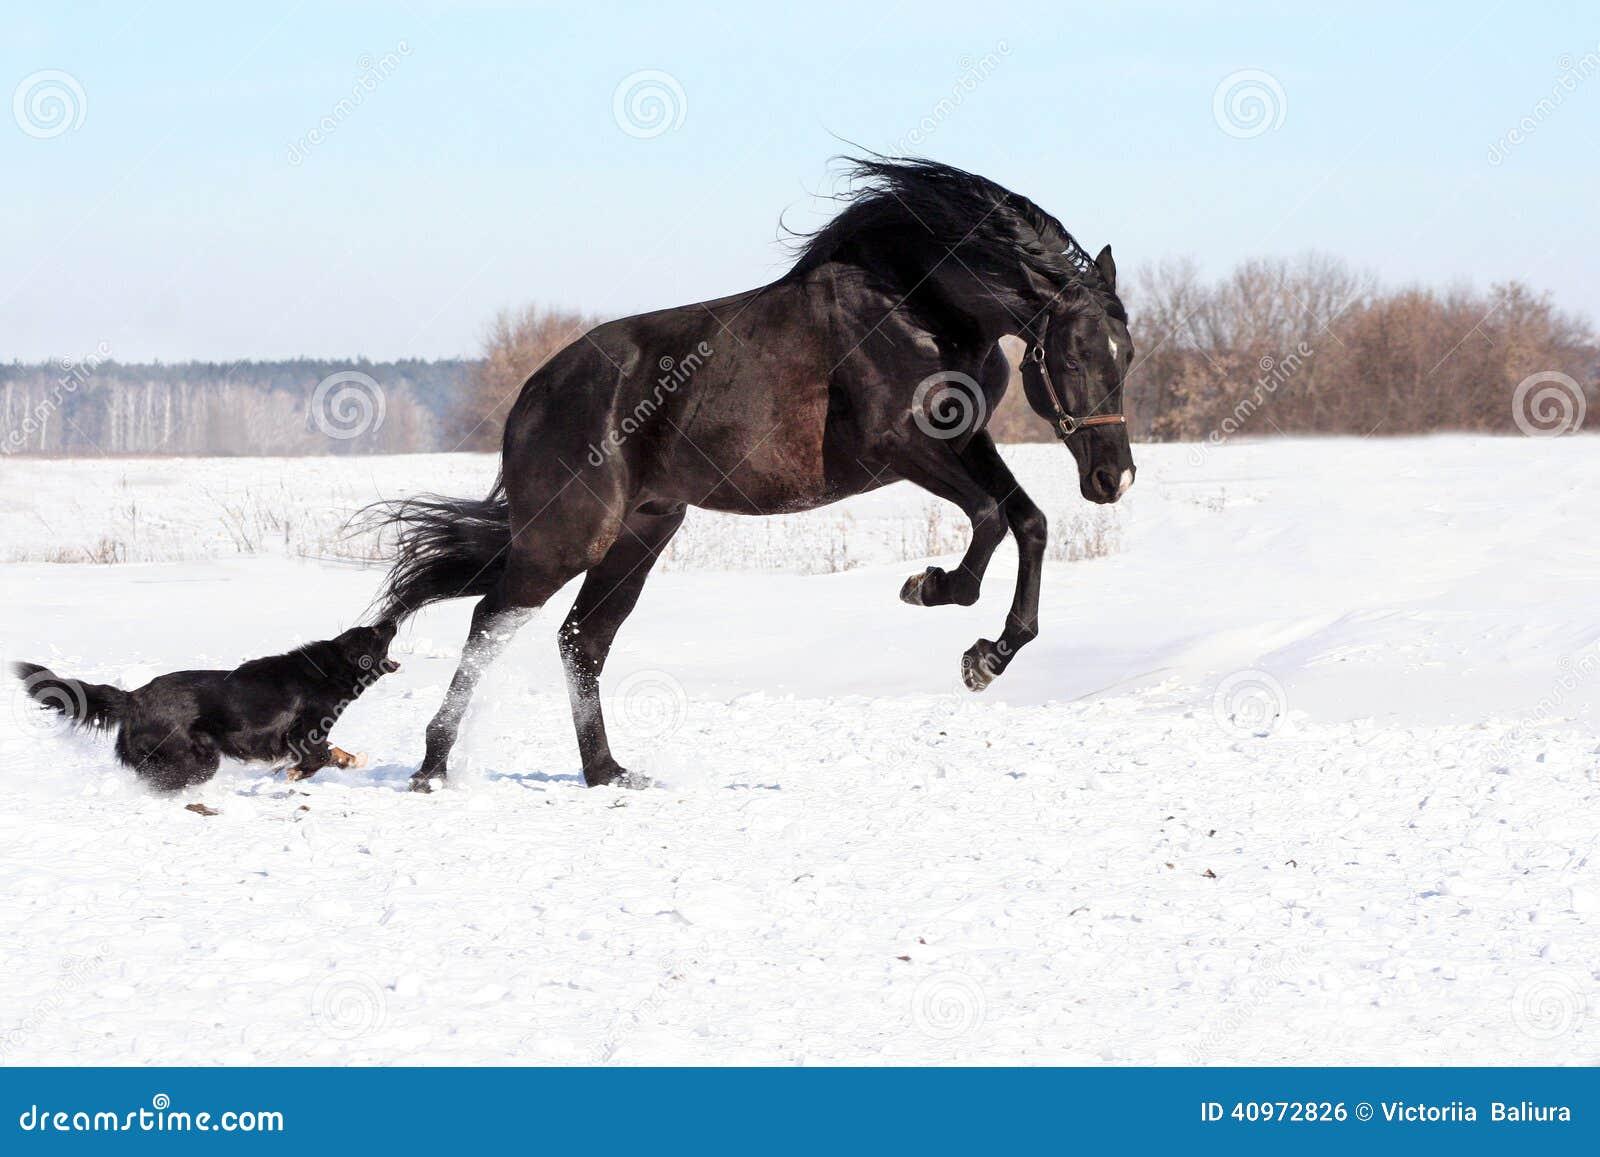 ukrainische pferdezuchtpferde stockfoto bild 40972826. Black Bedroom Furniture Sets. Home Design Ideas